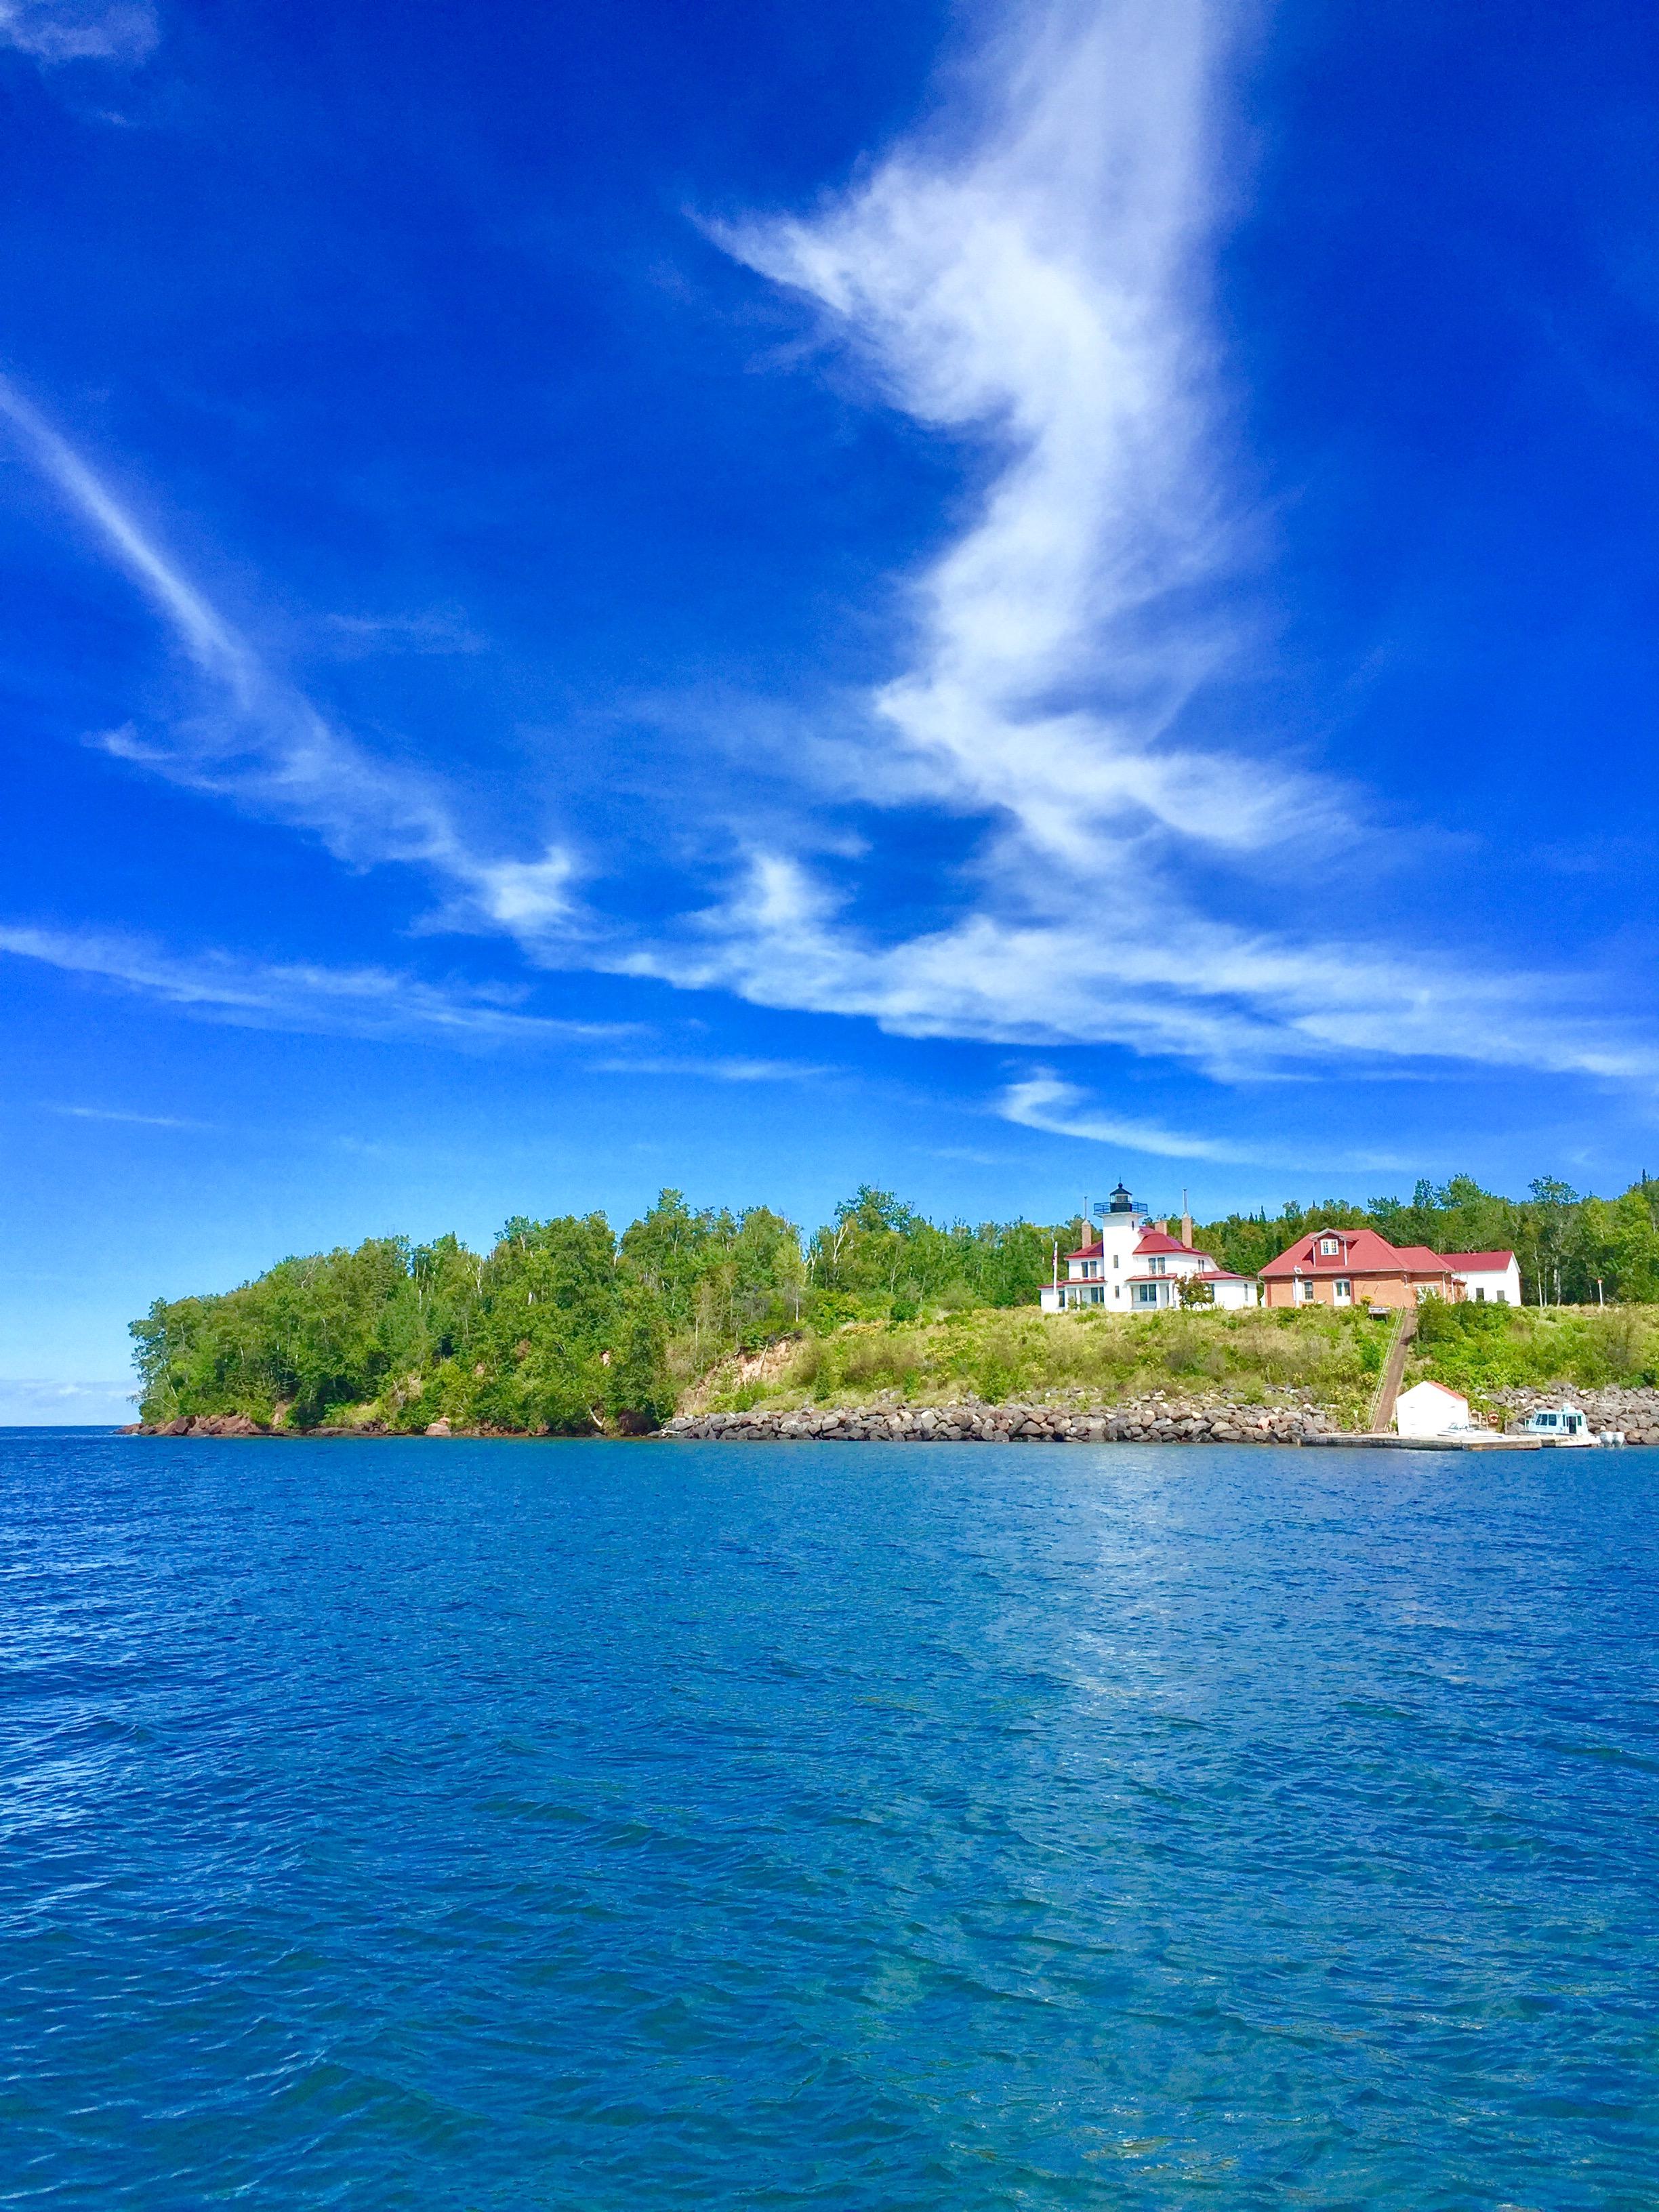 Light House Apostle Islands on Lake Superior